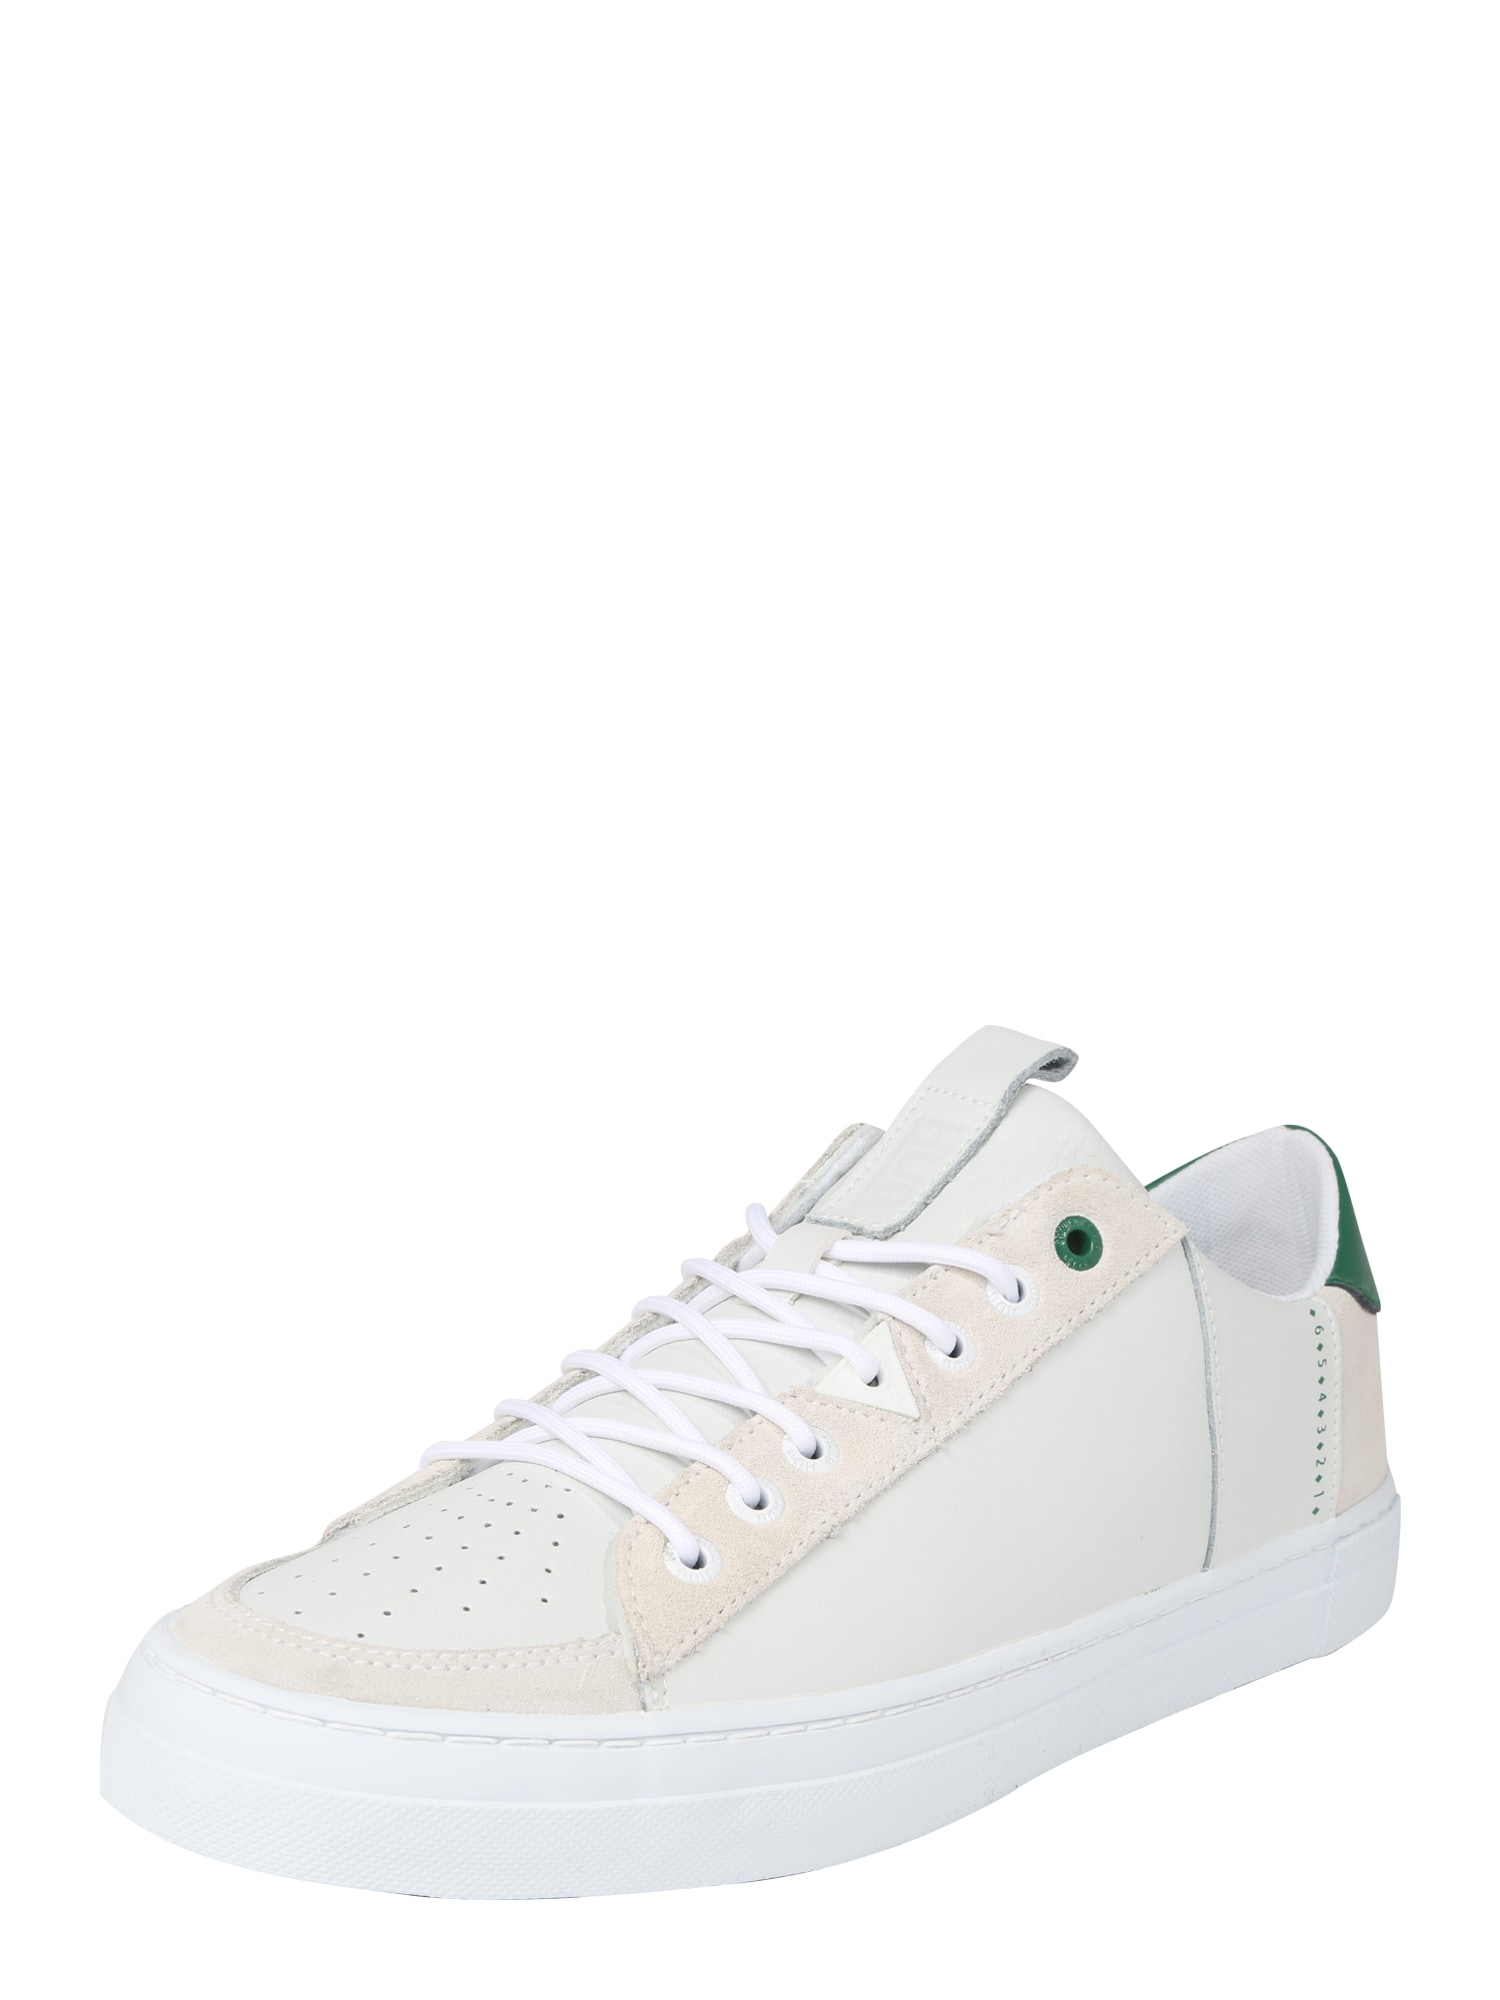 Tenisky Tournament-M L31 zelená bílá HUB